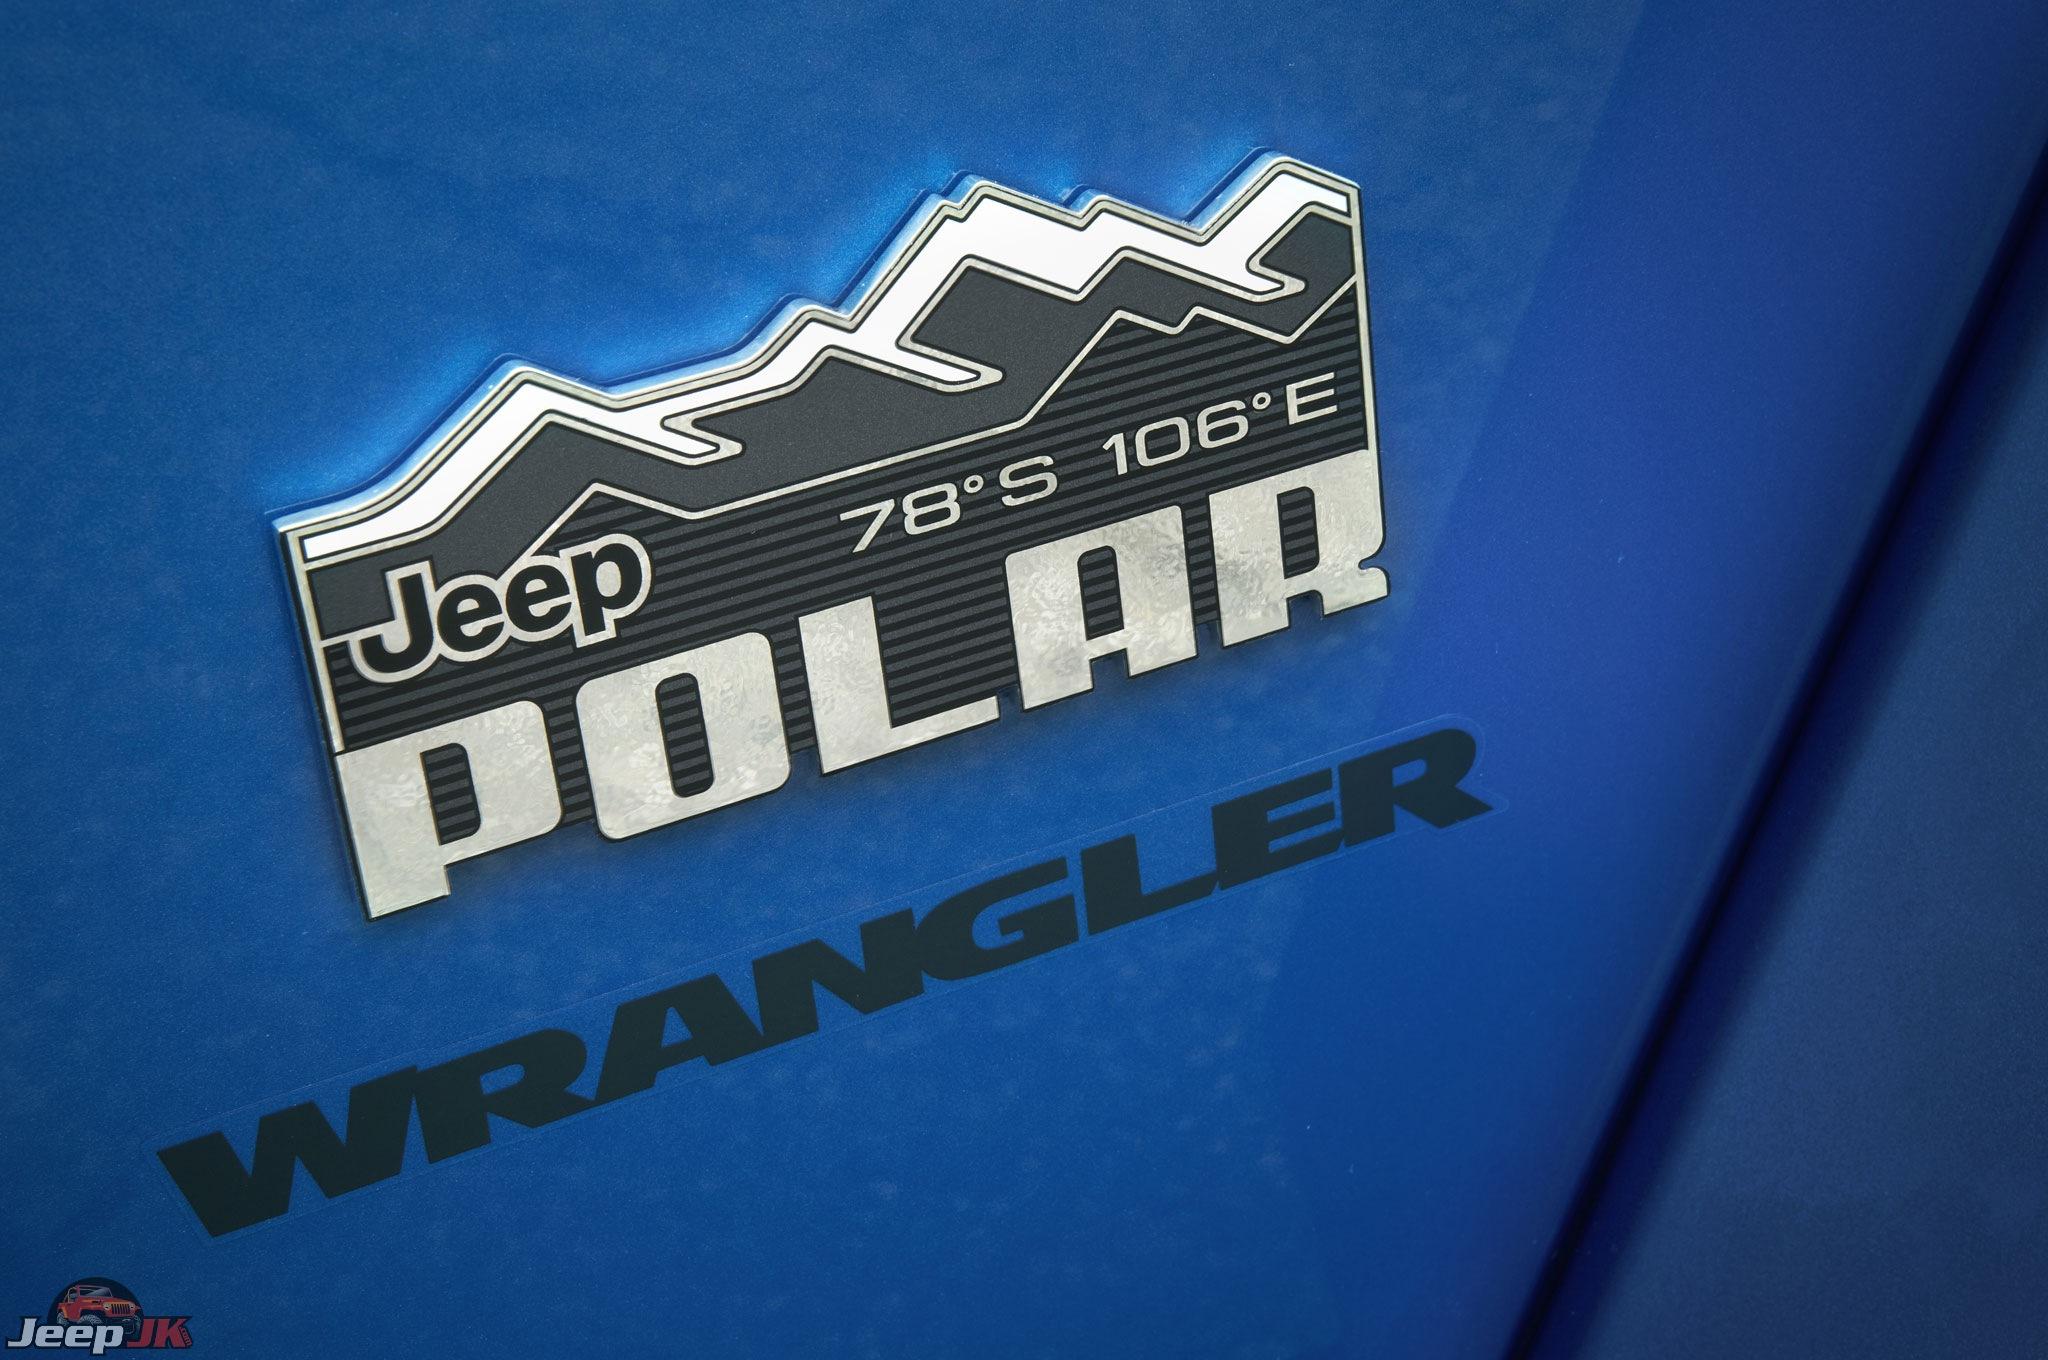 Wrangler Polar Edition Jeep Jk